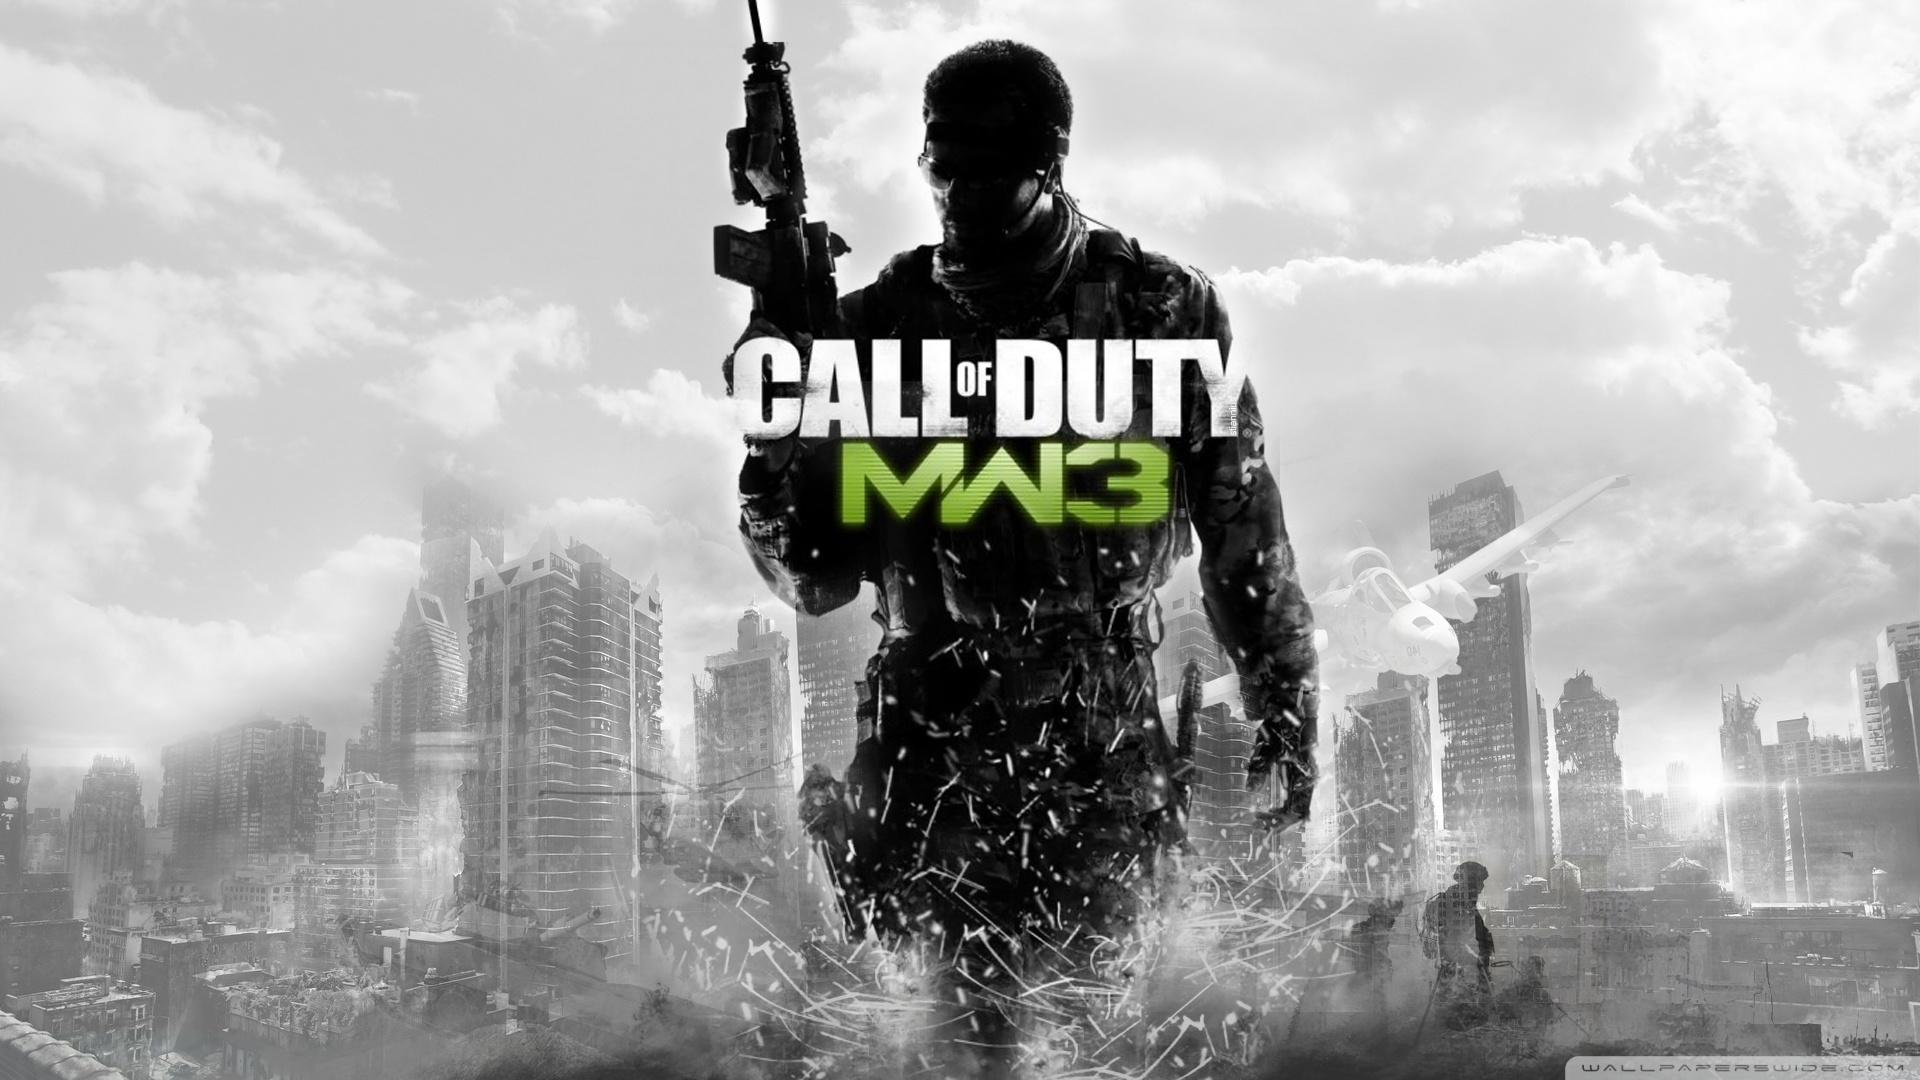 download WallpapersWidecom Call Of Duty HD Desktop Wallpapers 1920x1080